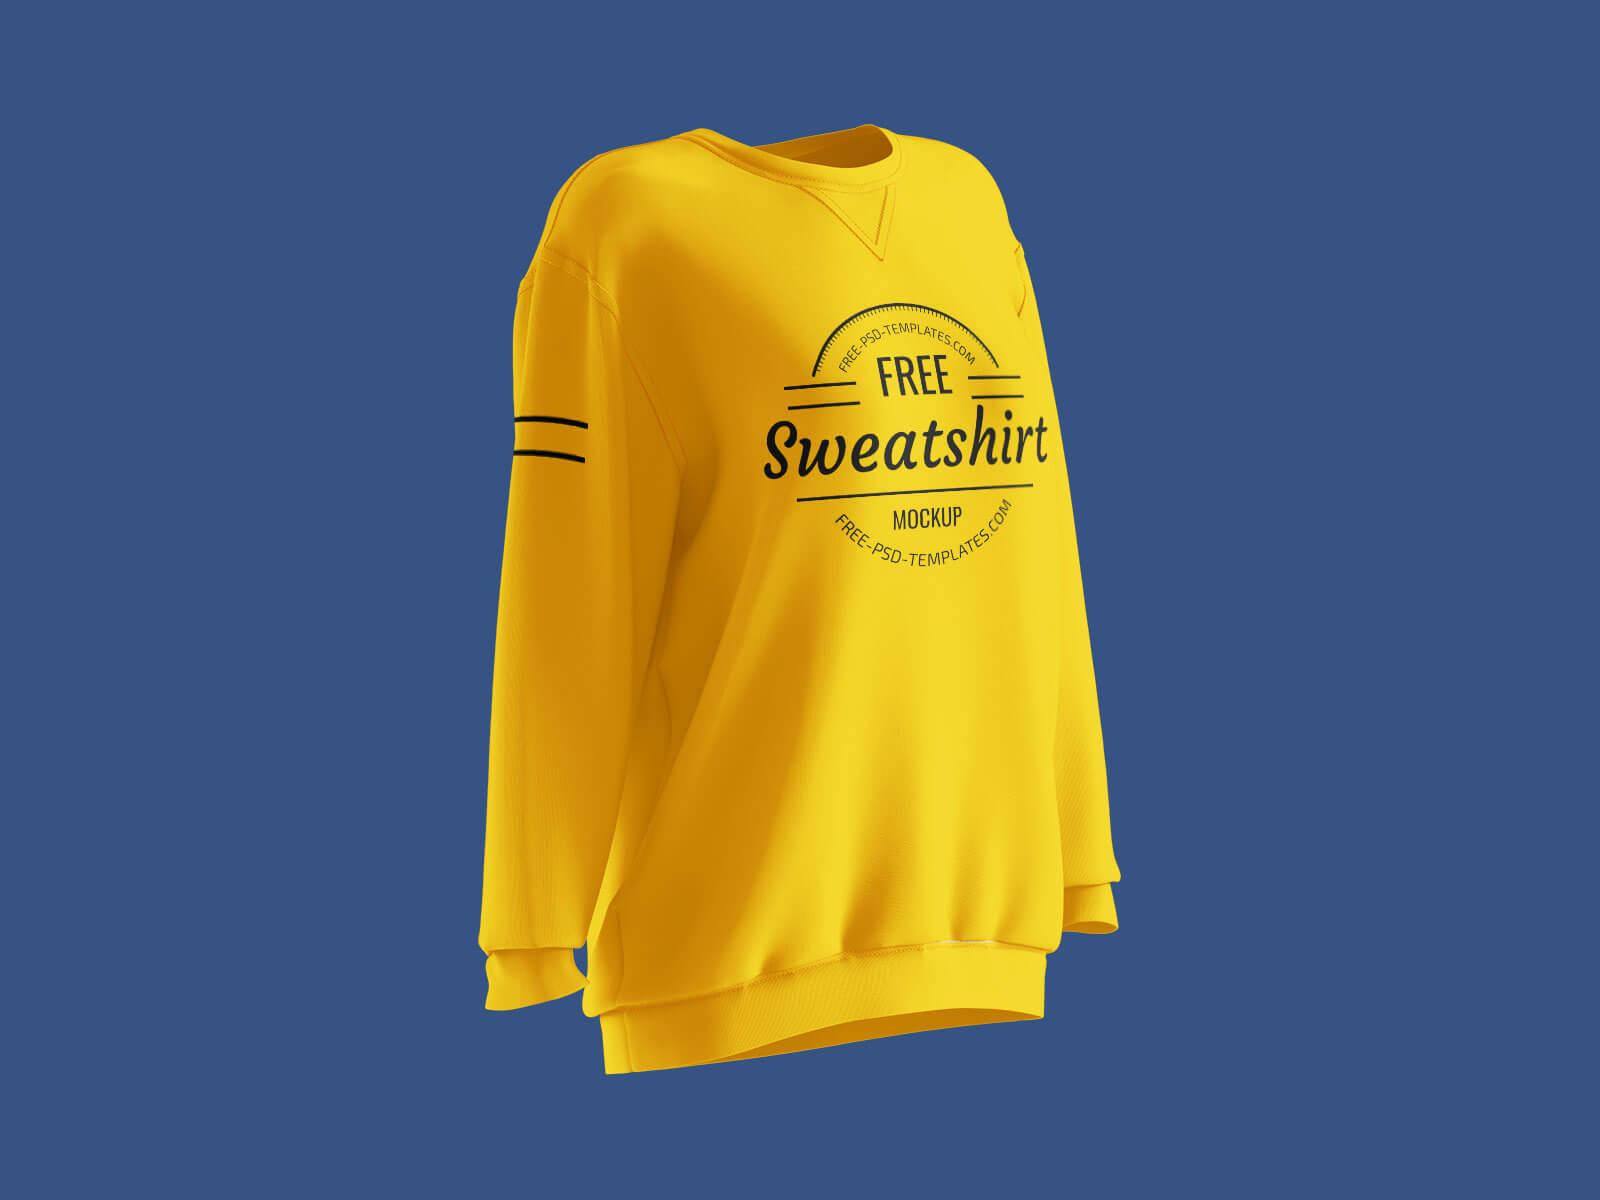 Free Long Sleeves Women's Sweatshirt Mockup PSD Set (2)